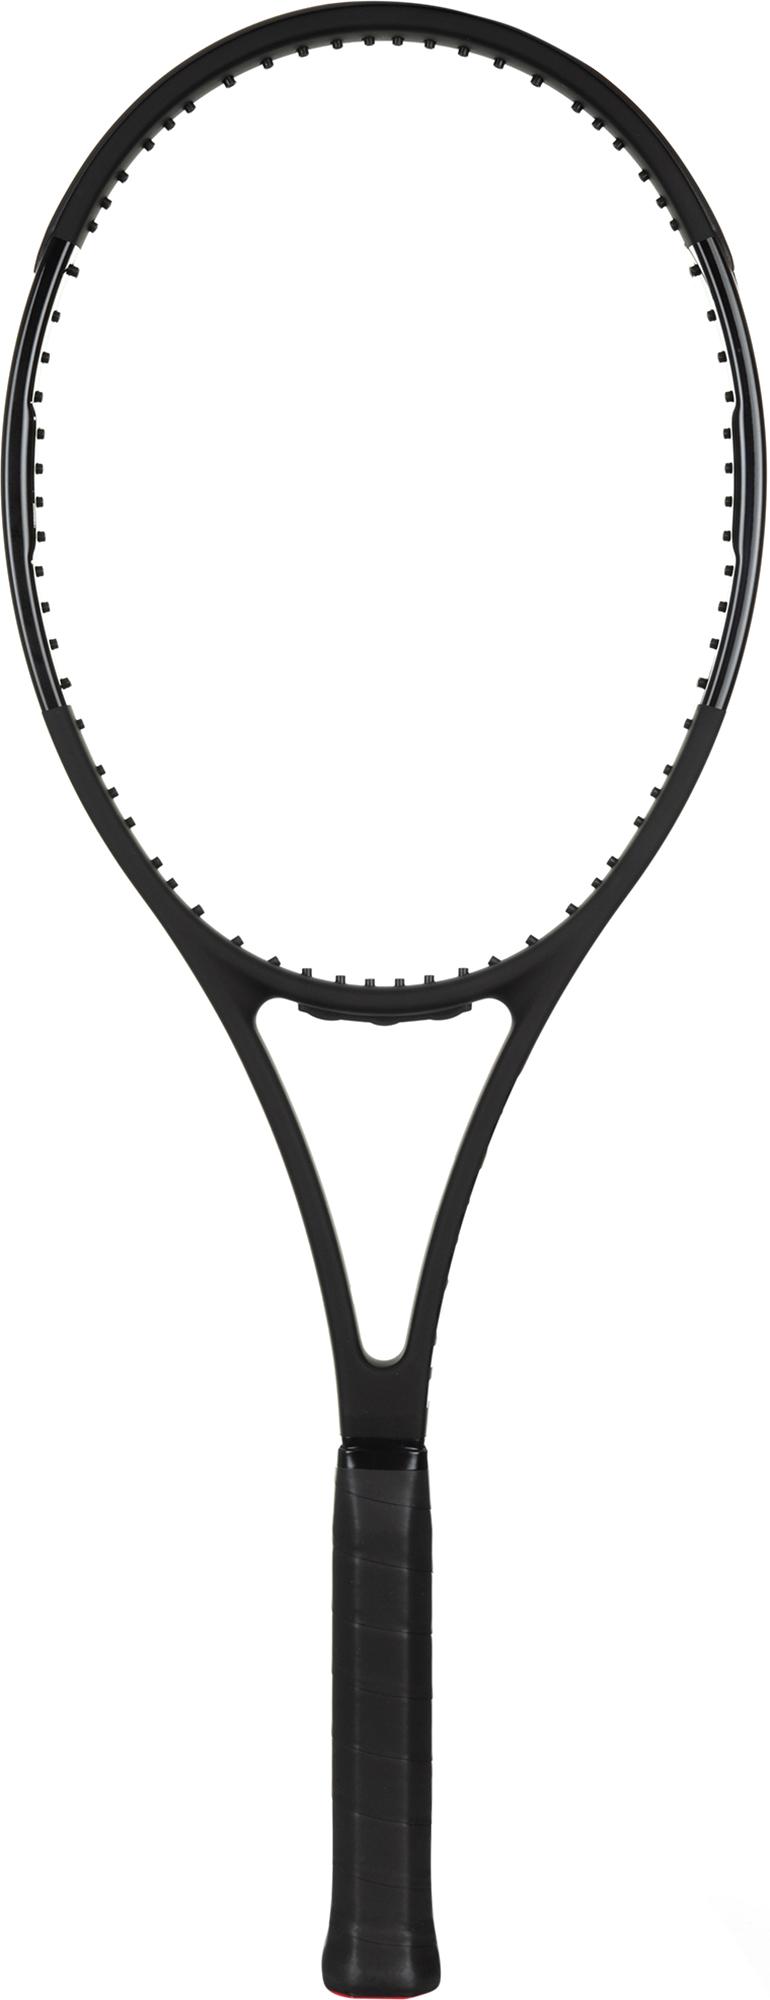 Wilson Ракетка для большого тенниса Wilson Pro Staff, размер 3 wilson ракетка для большого тенниса wilson federer